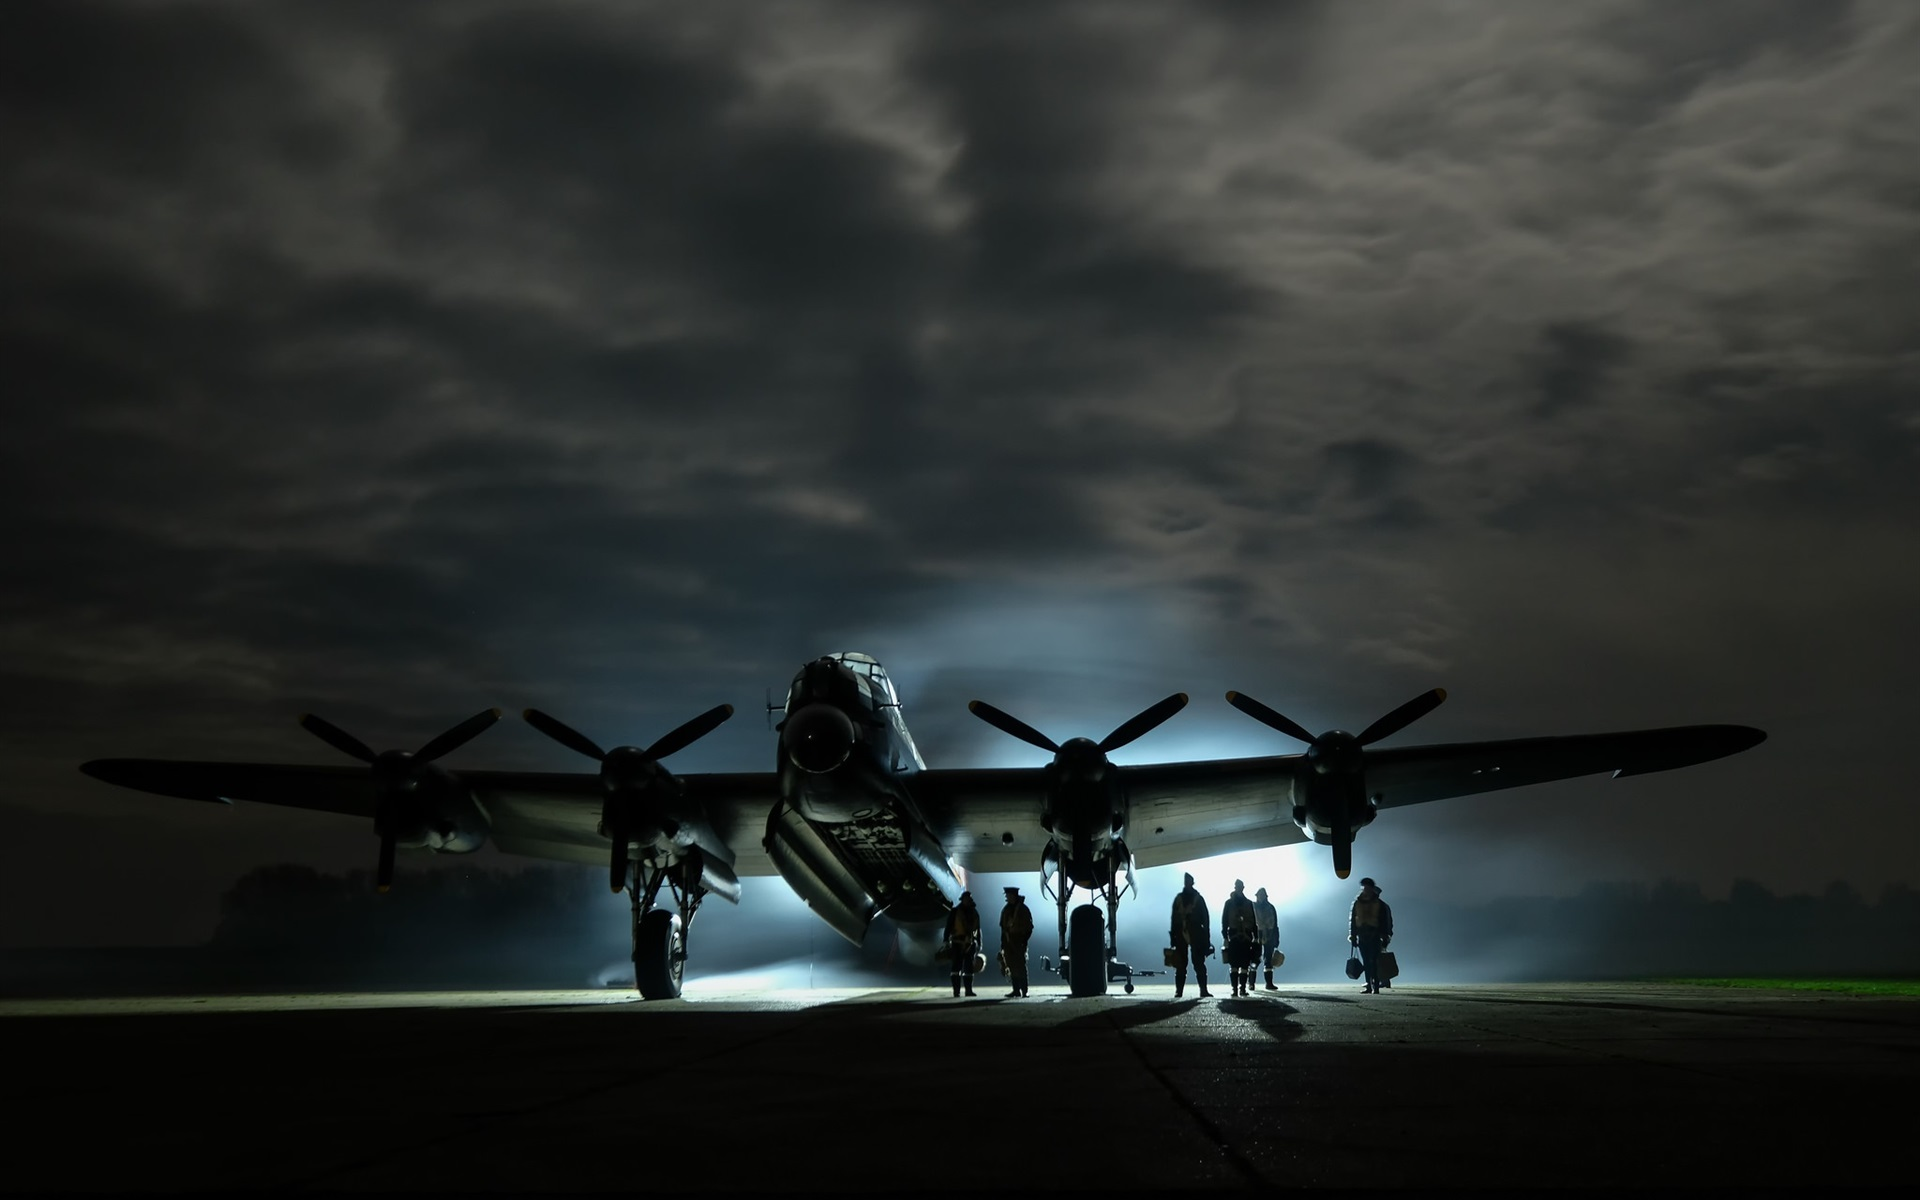 Good Wallpaper Night Airplane - Night-plane-people_1920x1200  Perfect Image Reference.jpg